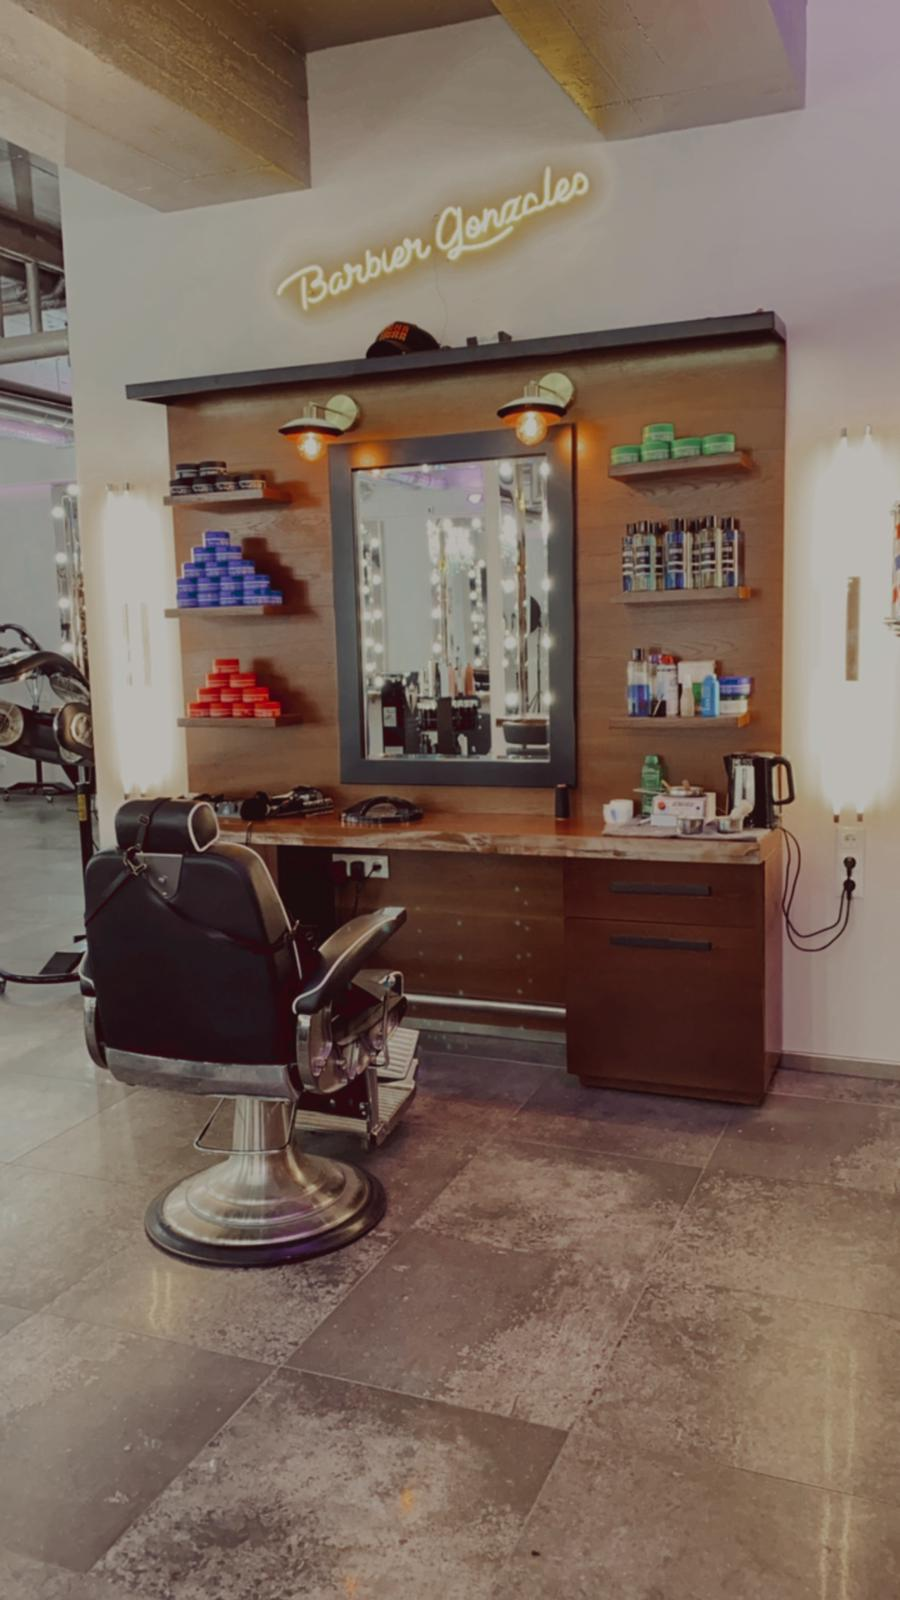 Barbier Gonzaloes bei DA VINCE HAIR & MAKE-UP